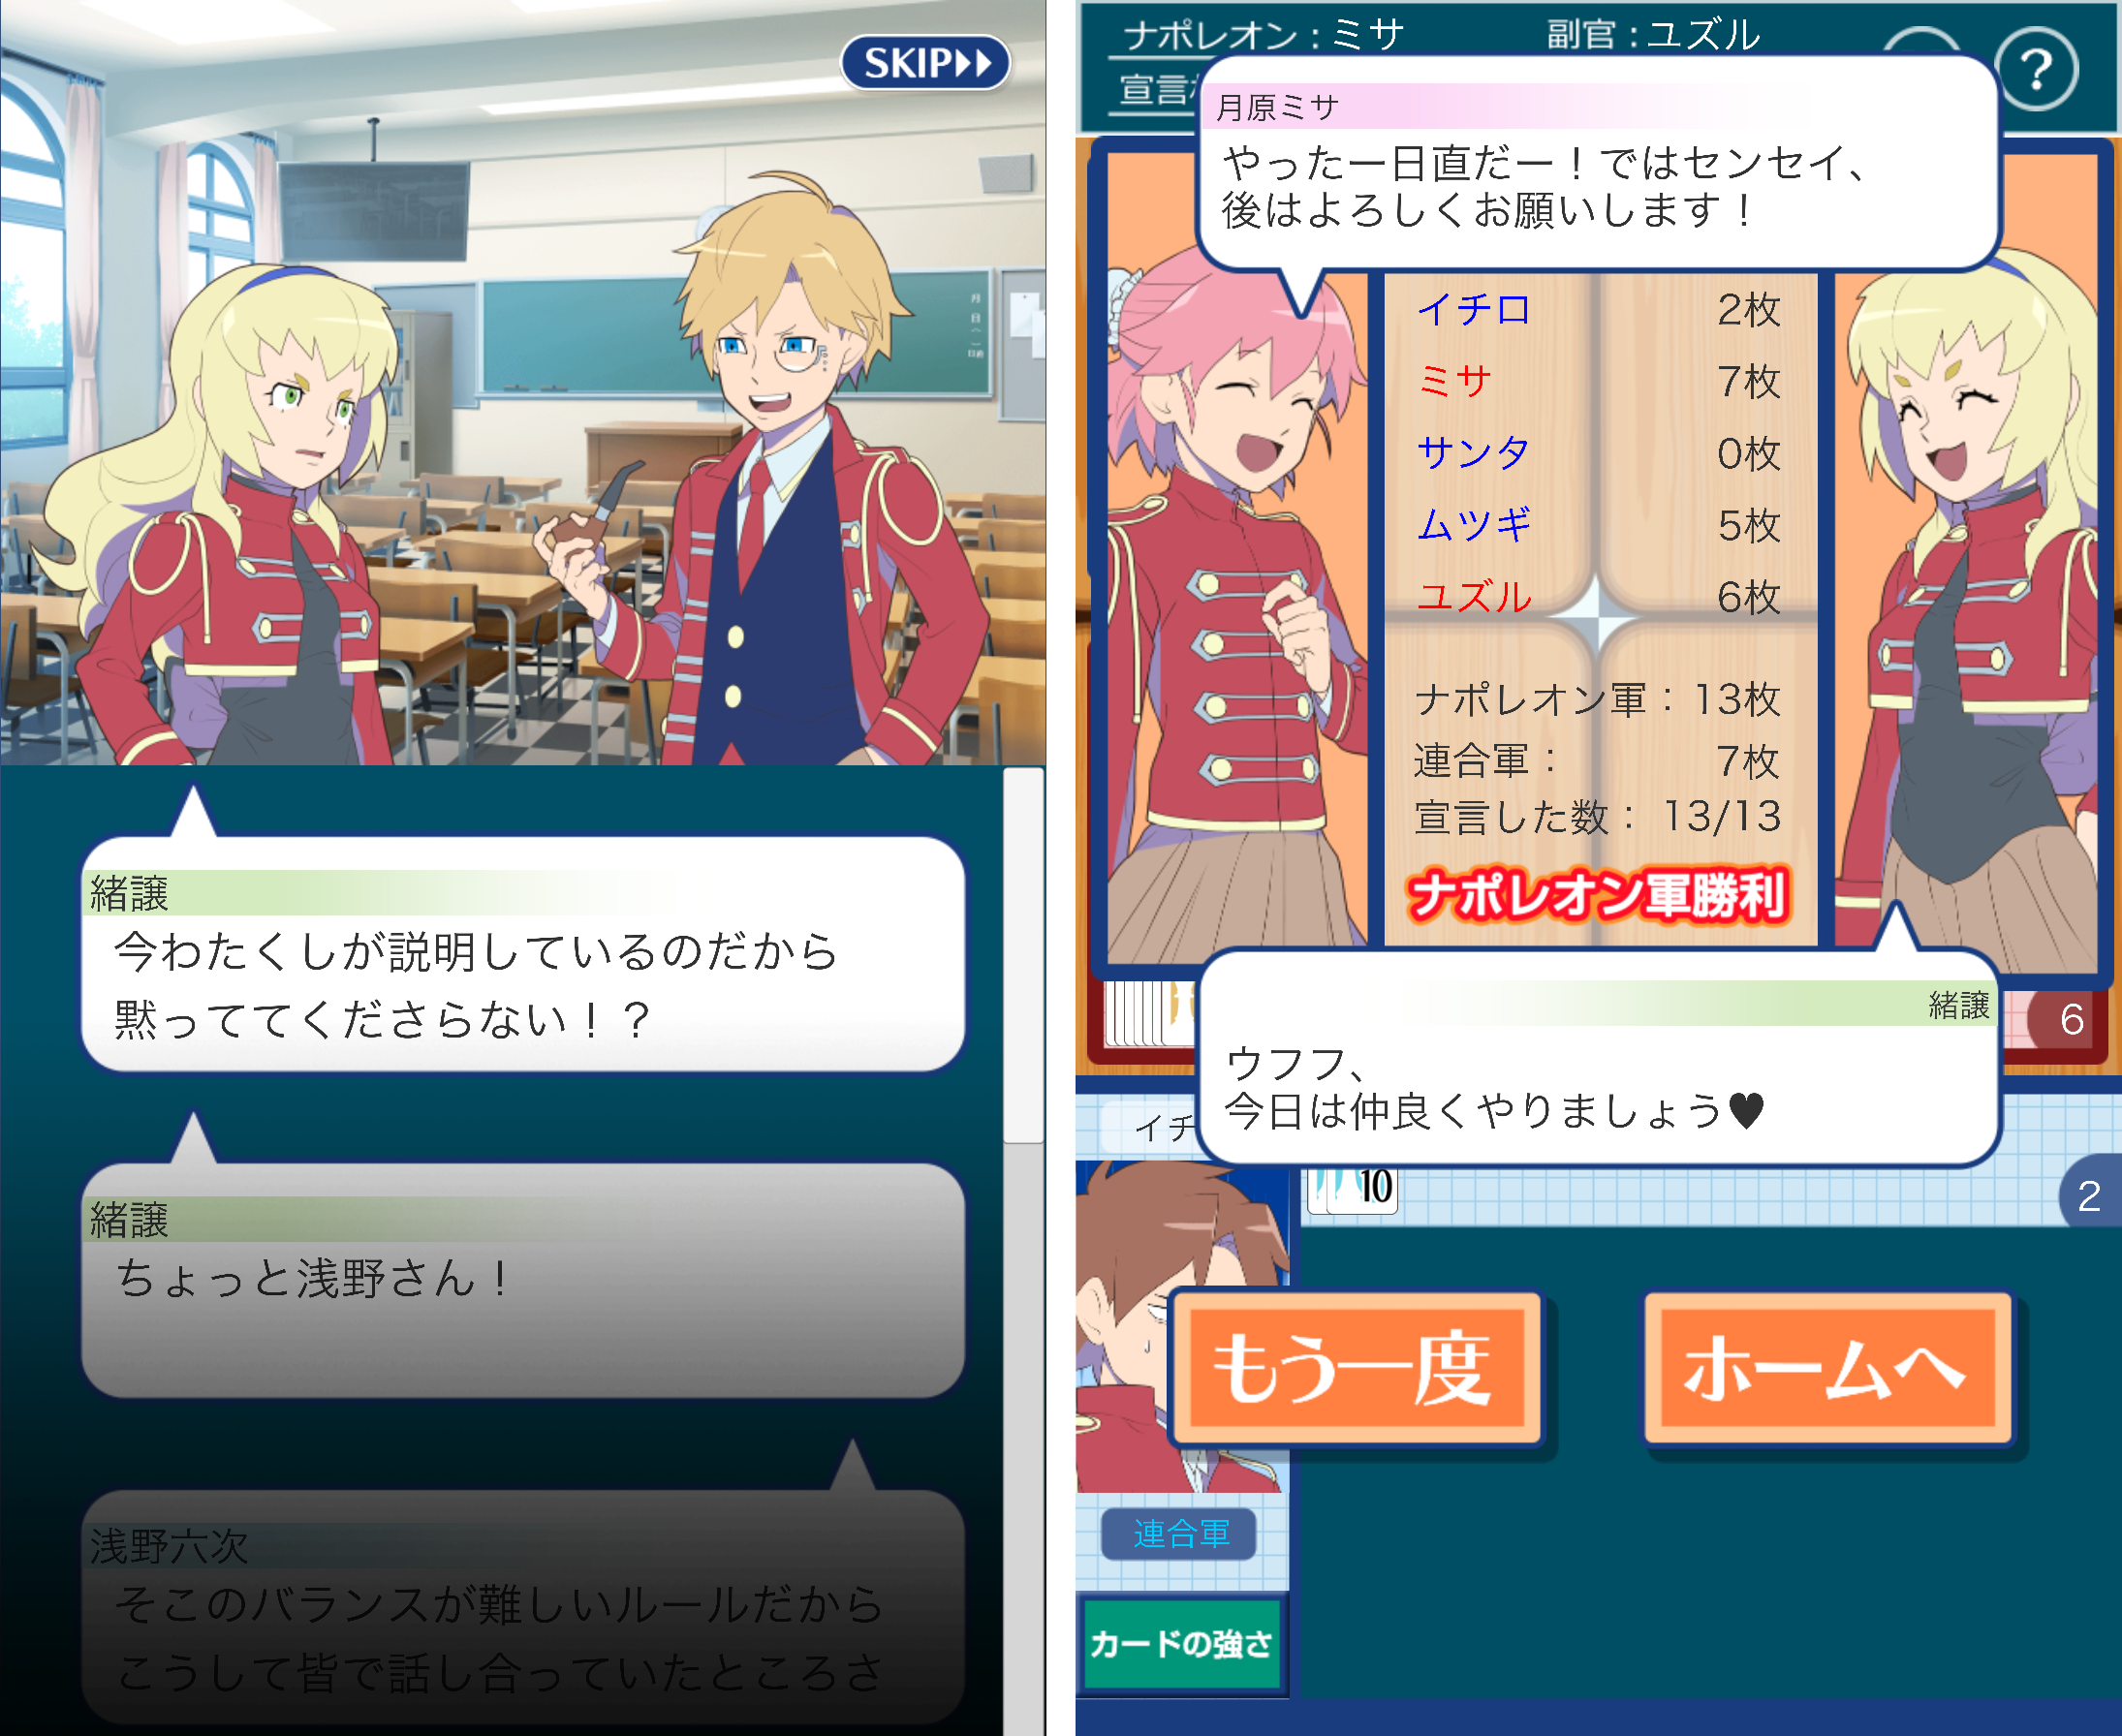 androidアプリ 日直争奪ナポレオン学園(トランプゲーム)攻略スクリーンショット6